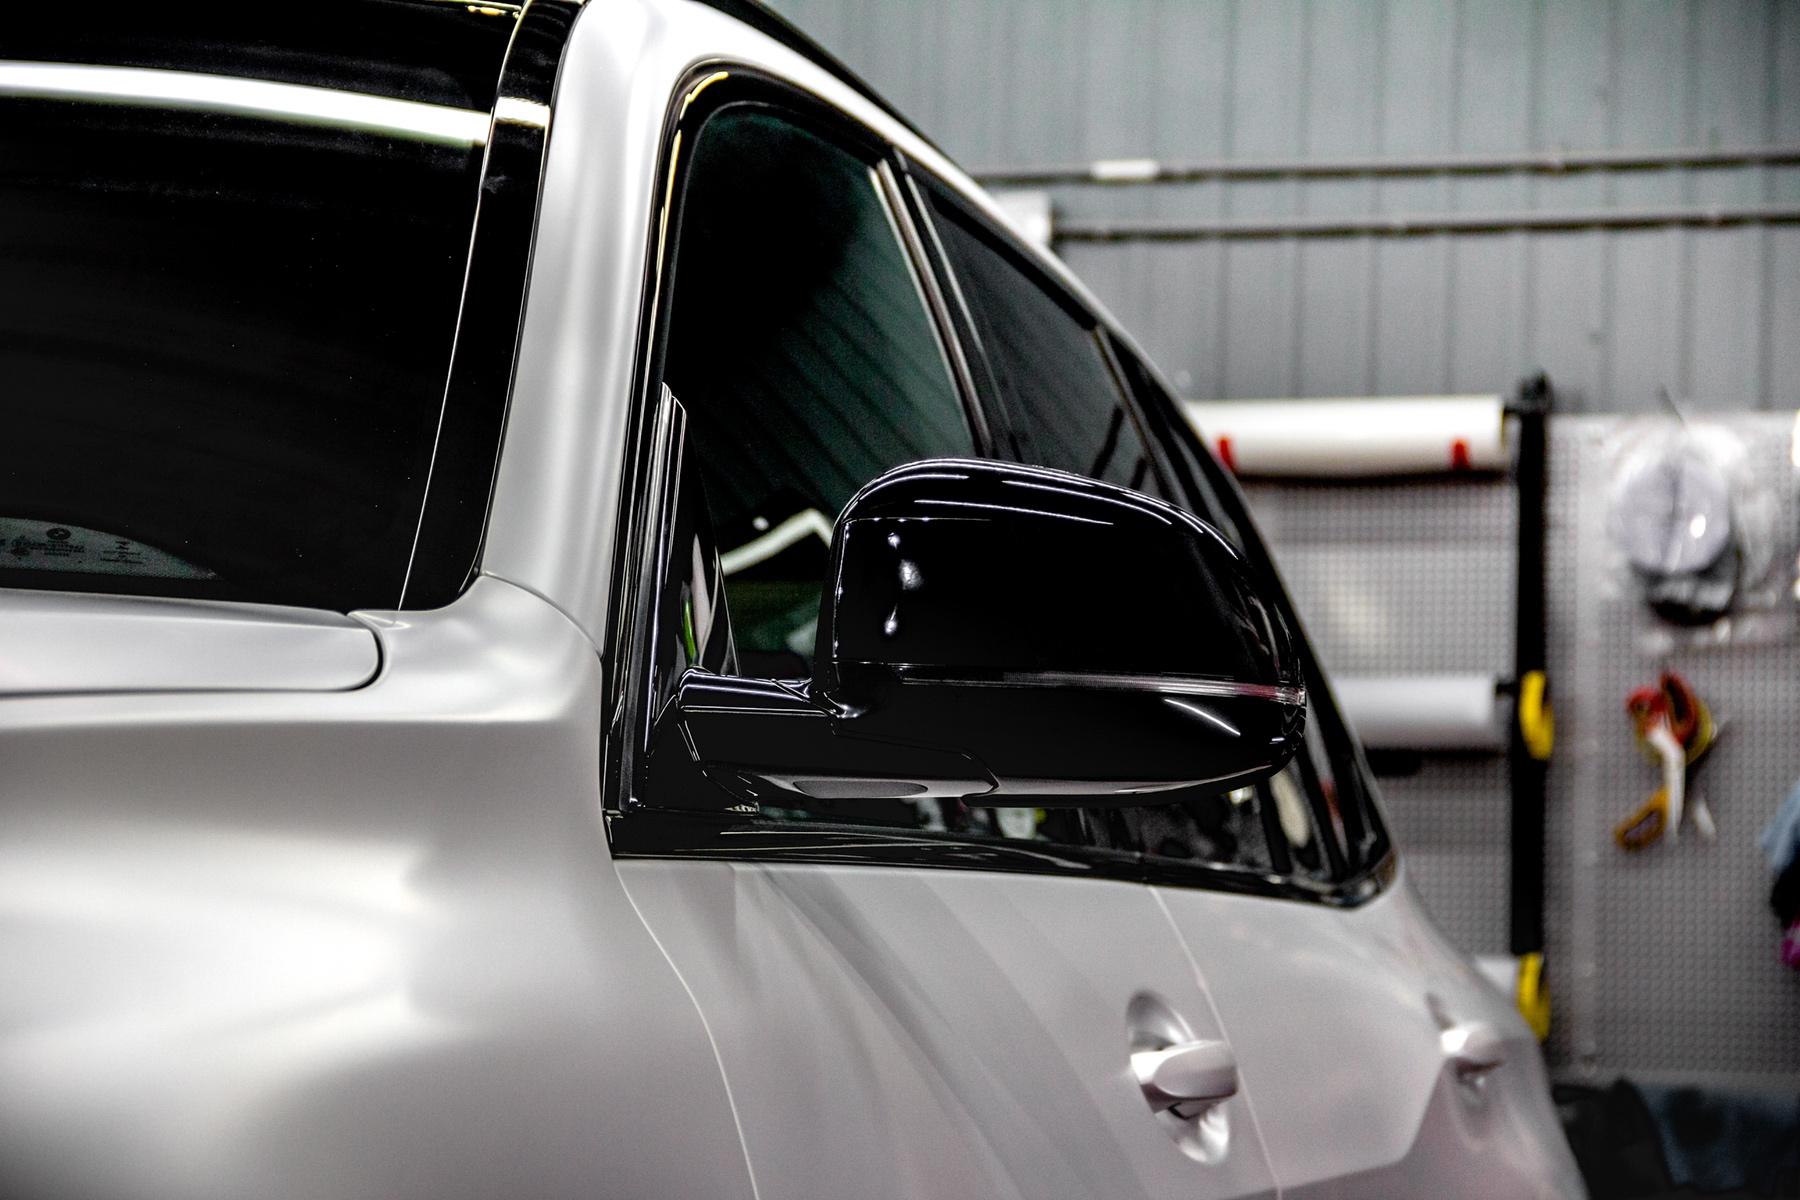 Детейлинг перламутрового BMW X5 - Тюмень - детейлинг-центр «АЛС»